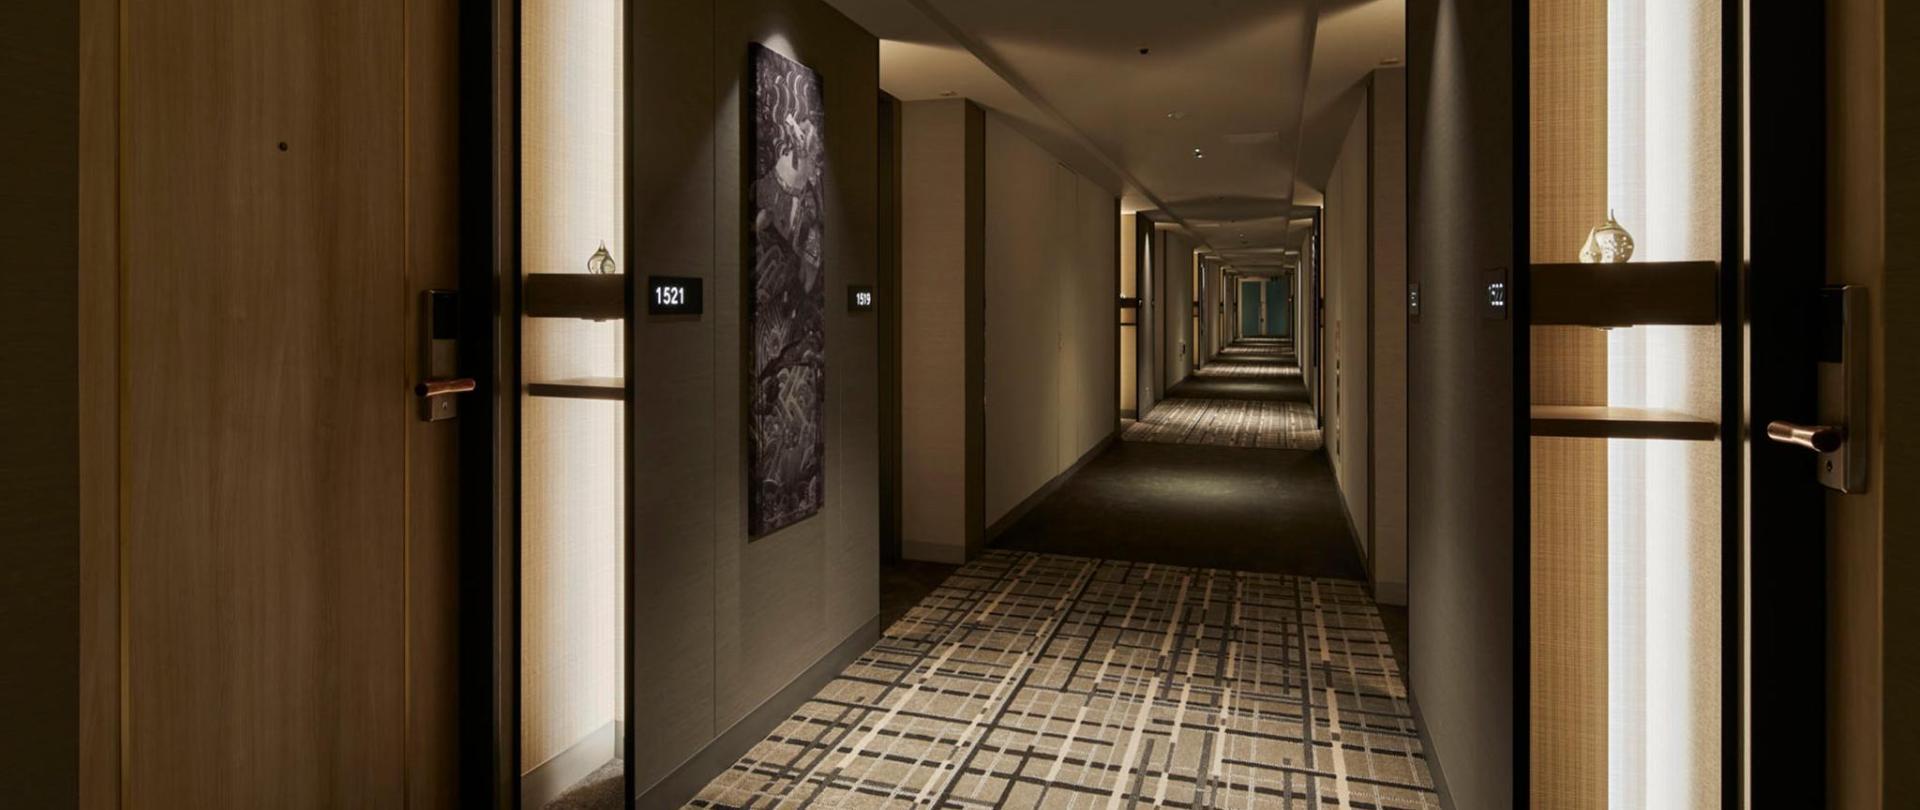 Guest room floor.jpg